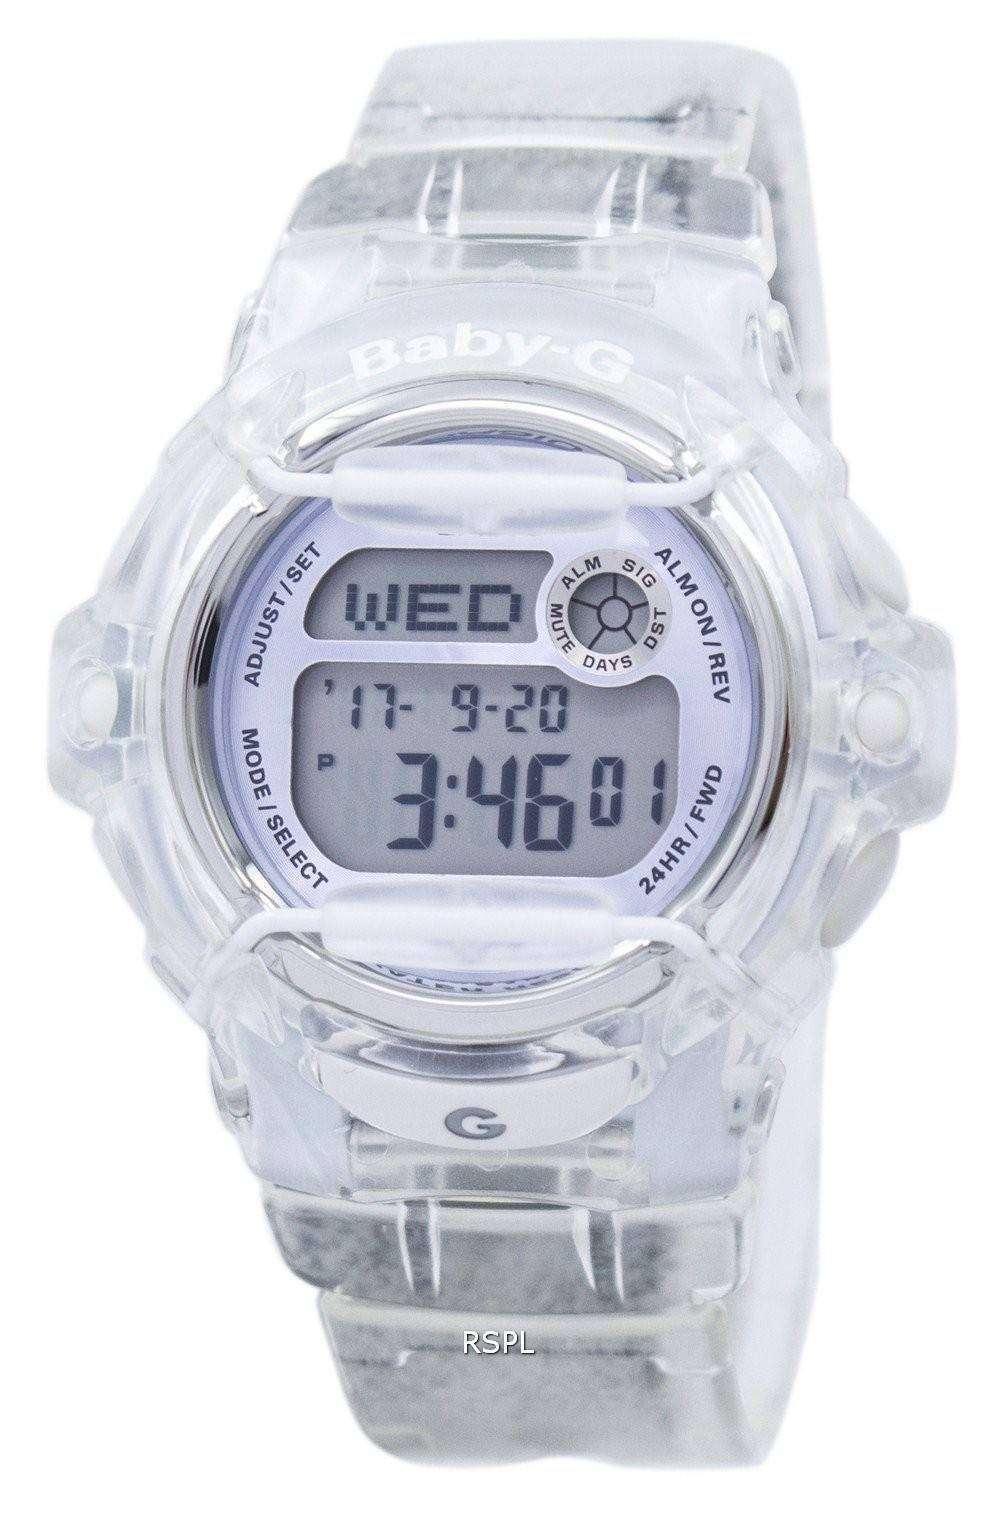 Casio Baby-G Shock Resistant Digital World Time Quartz BG-169R-7E Women s 1742f7ed66